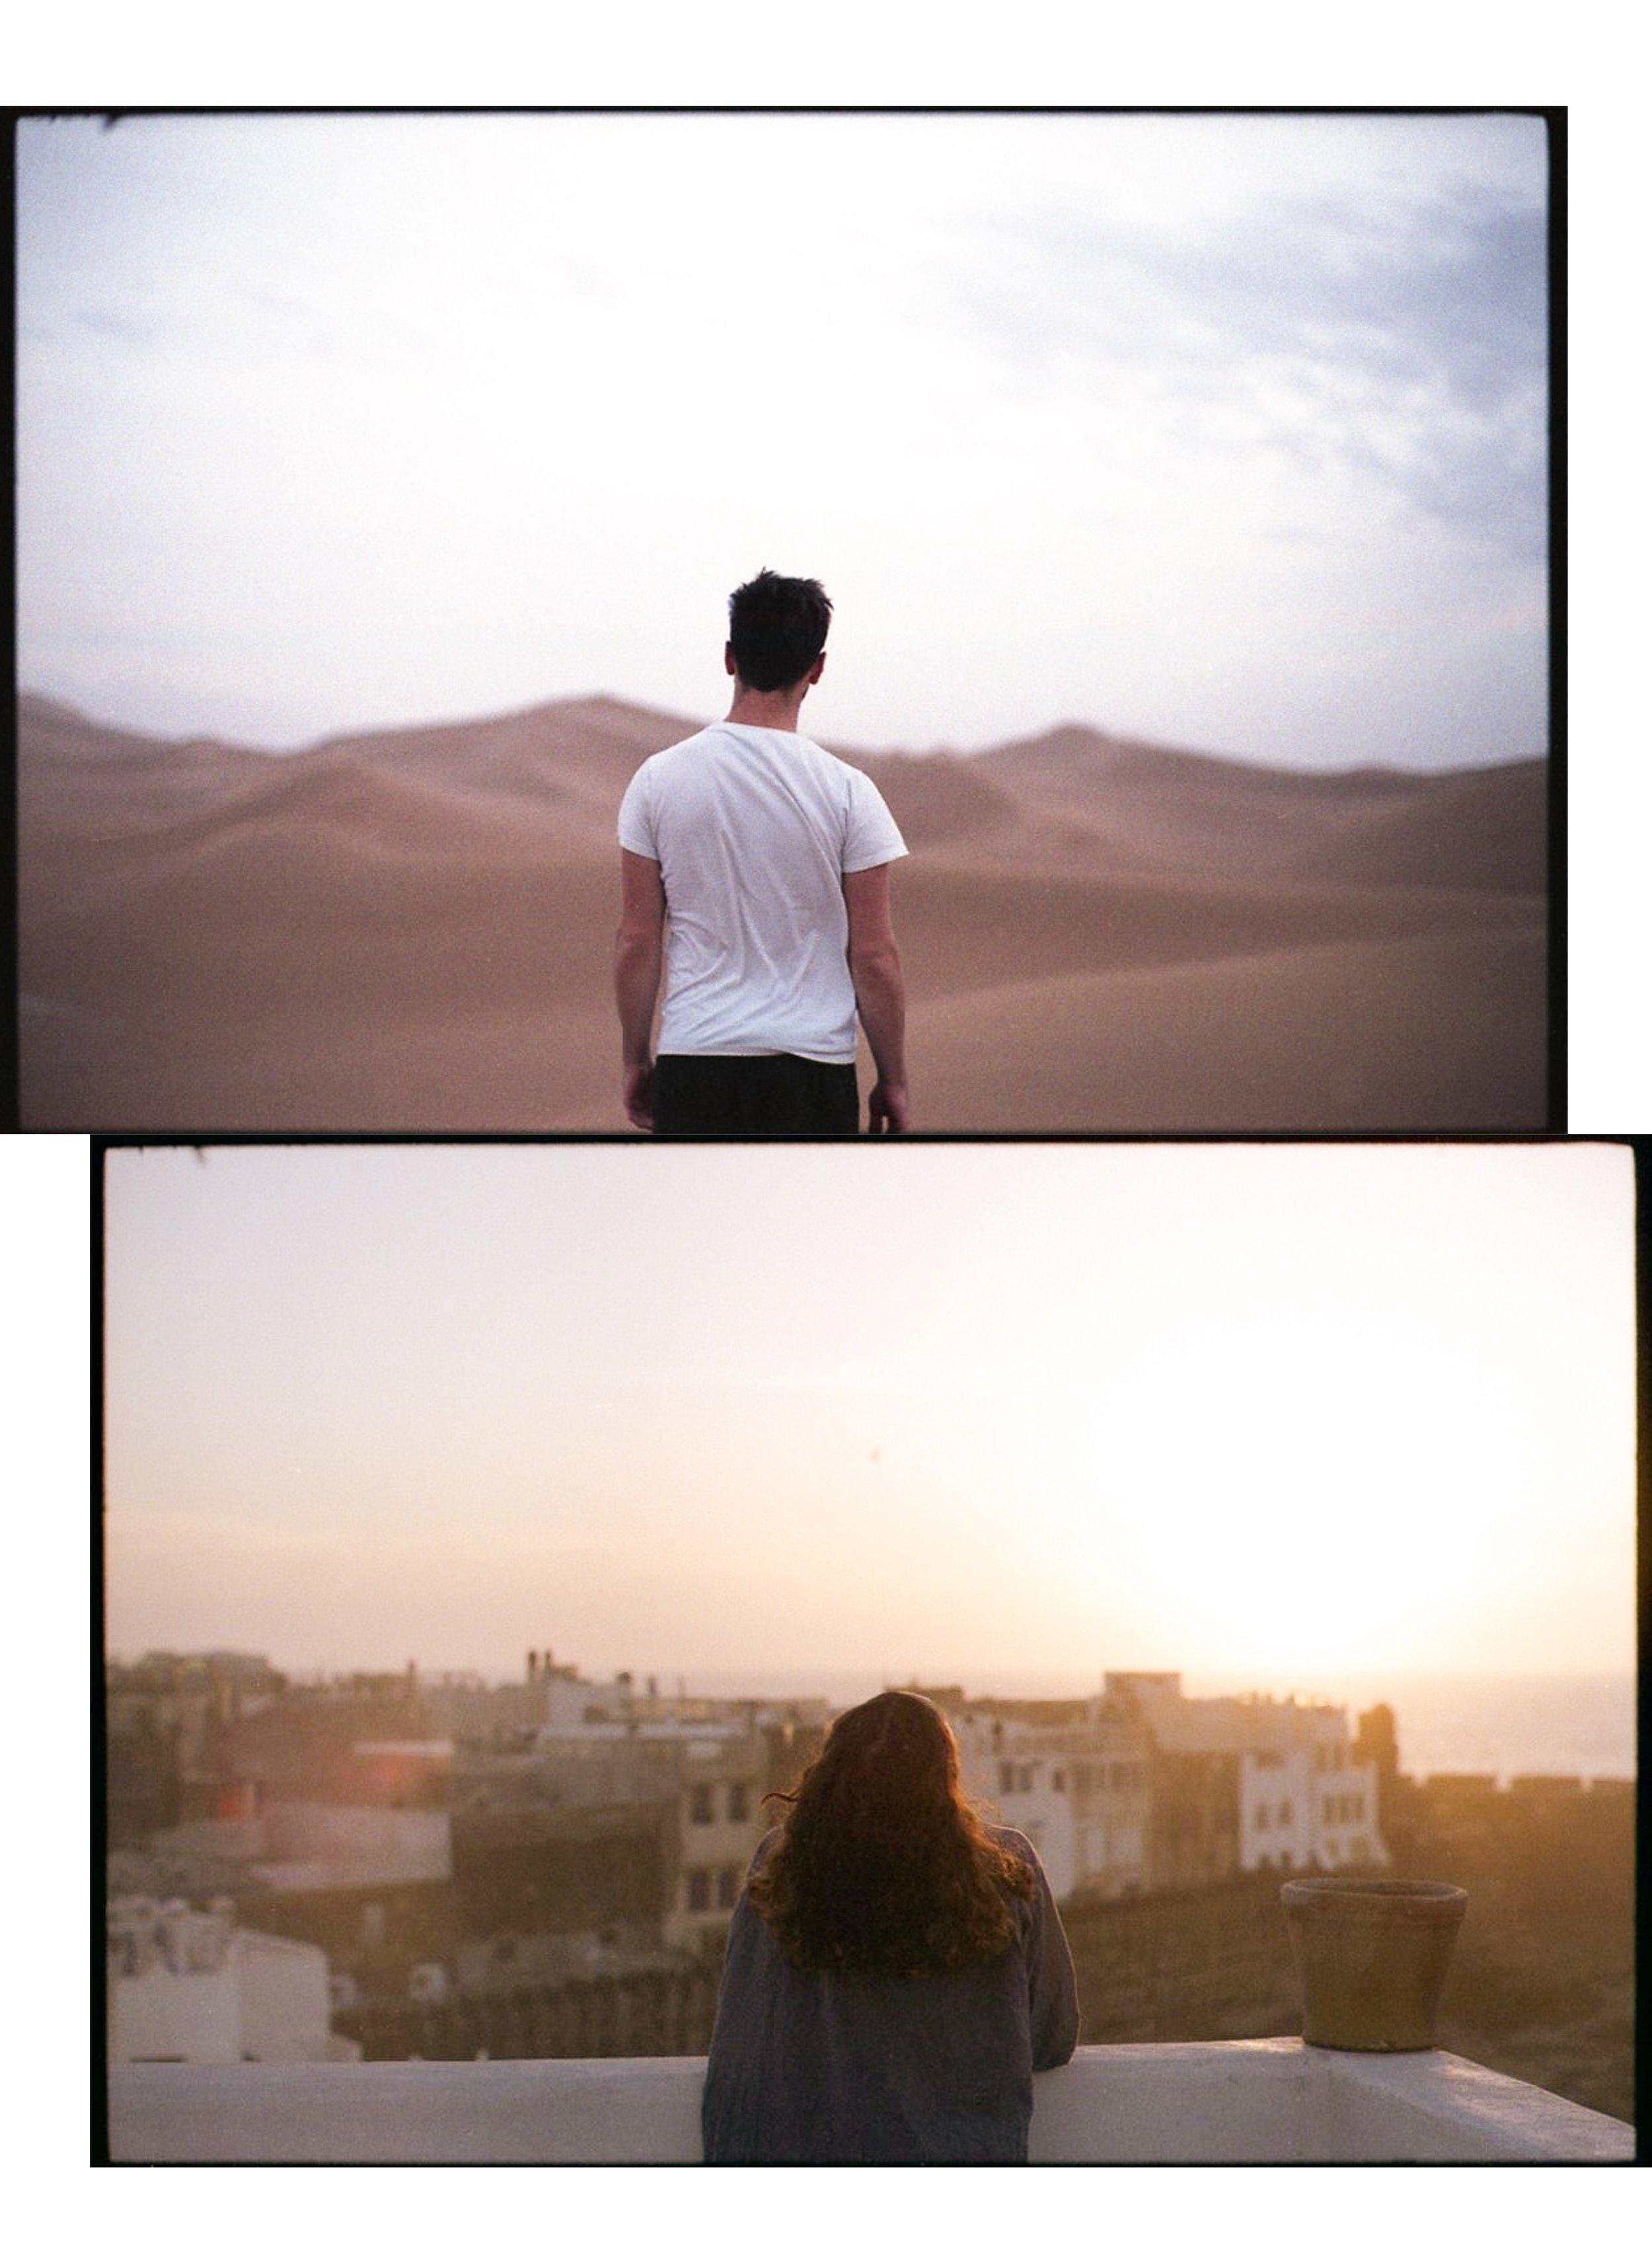 Morocco IV